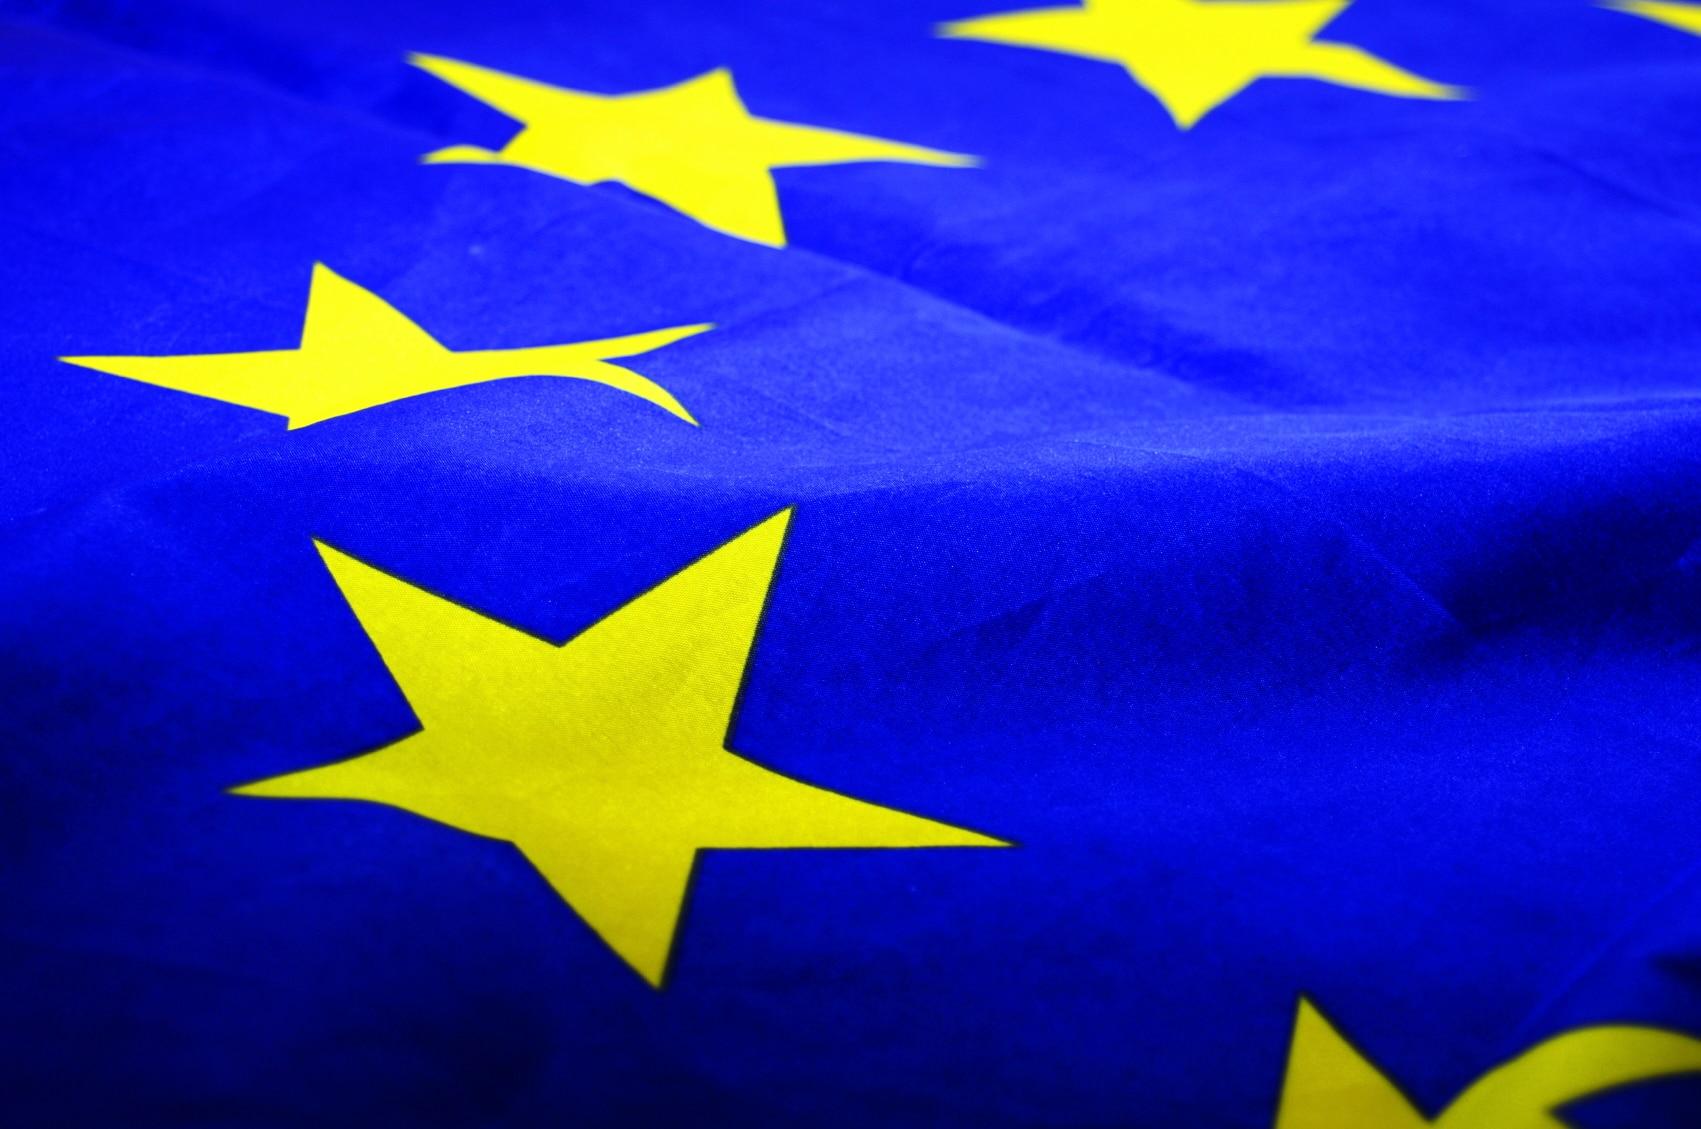 eu union europea europa bce recurso bbva